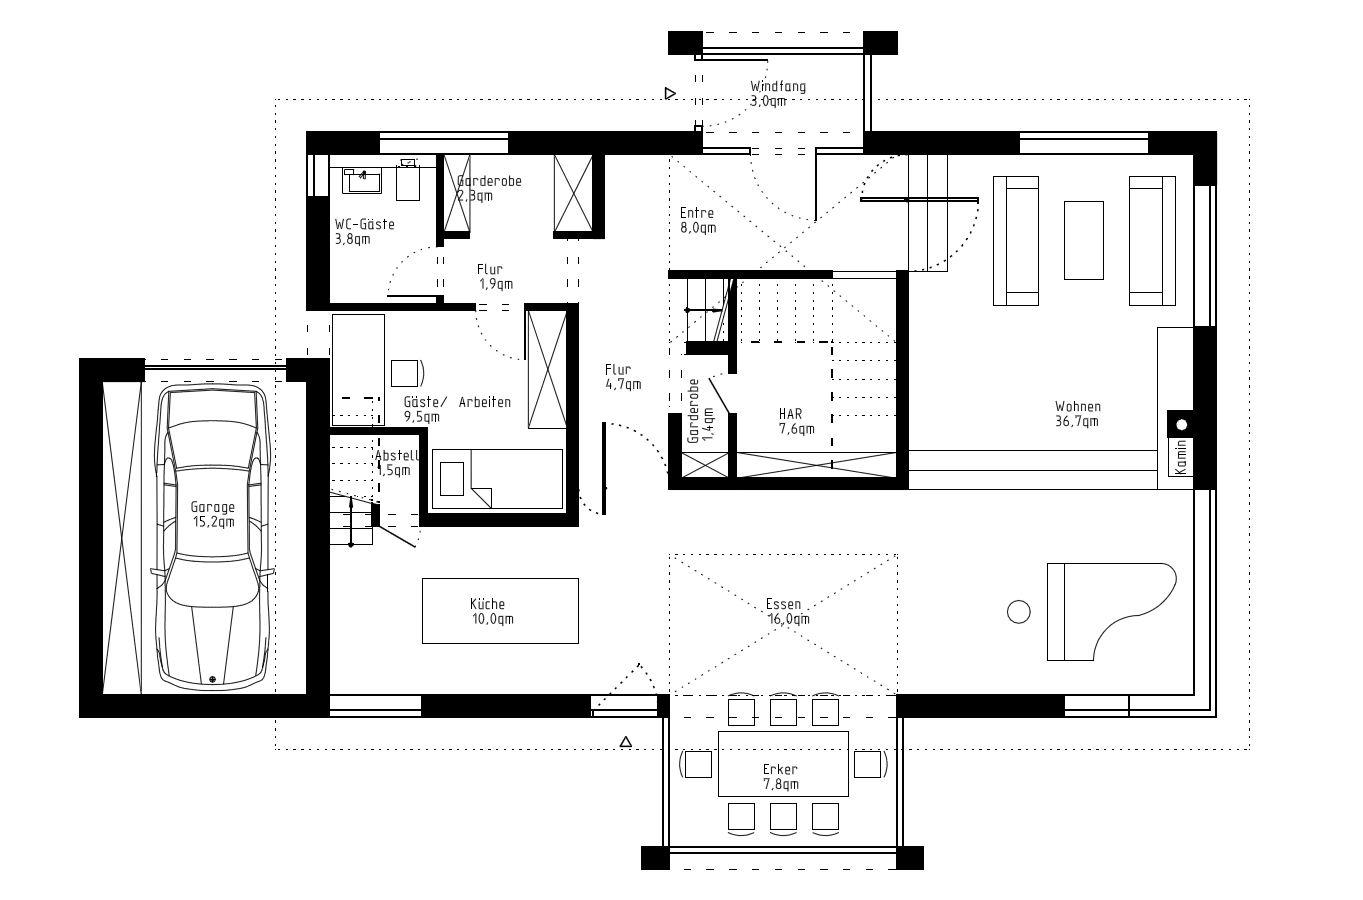 bauantrag planungsb ro genehmigungsplanung villen projekte haubau baugenehmigung. Black Bedroom Furniture Sets. Home Design Ideas